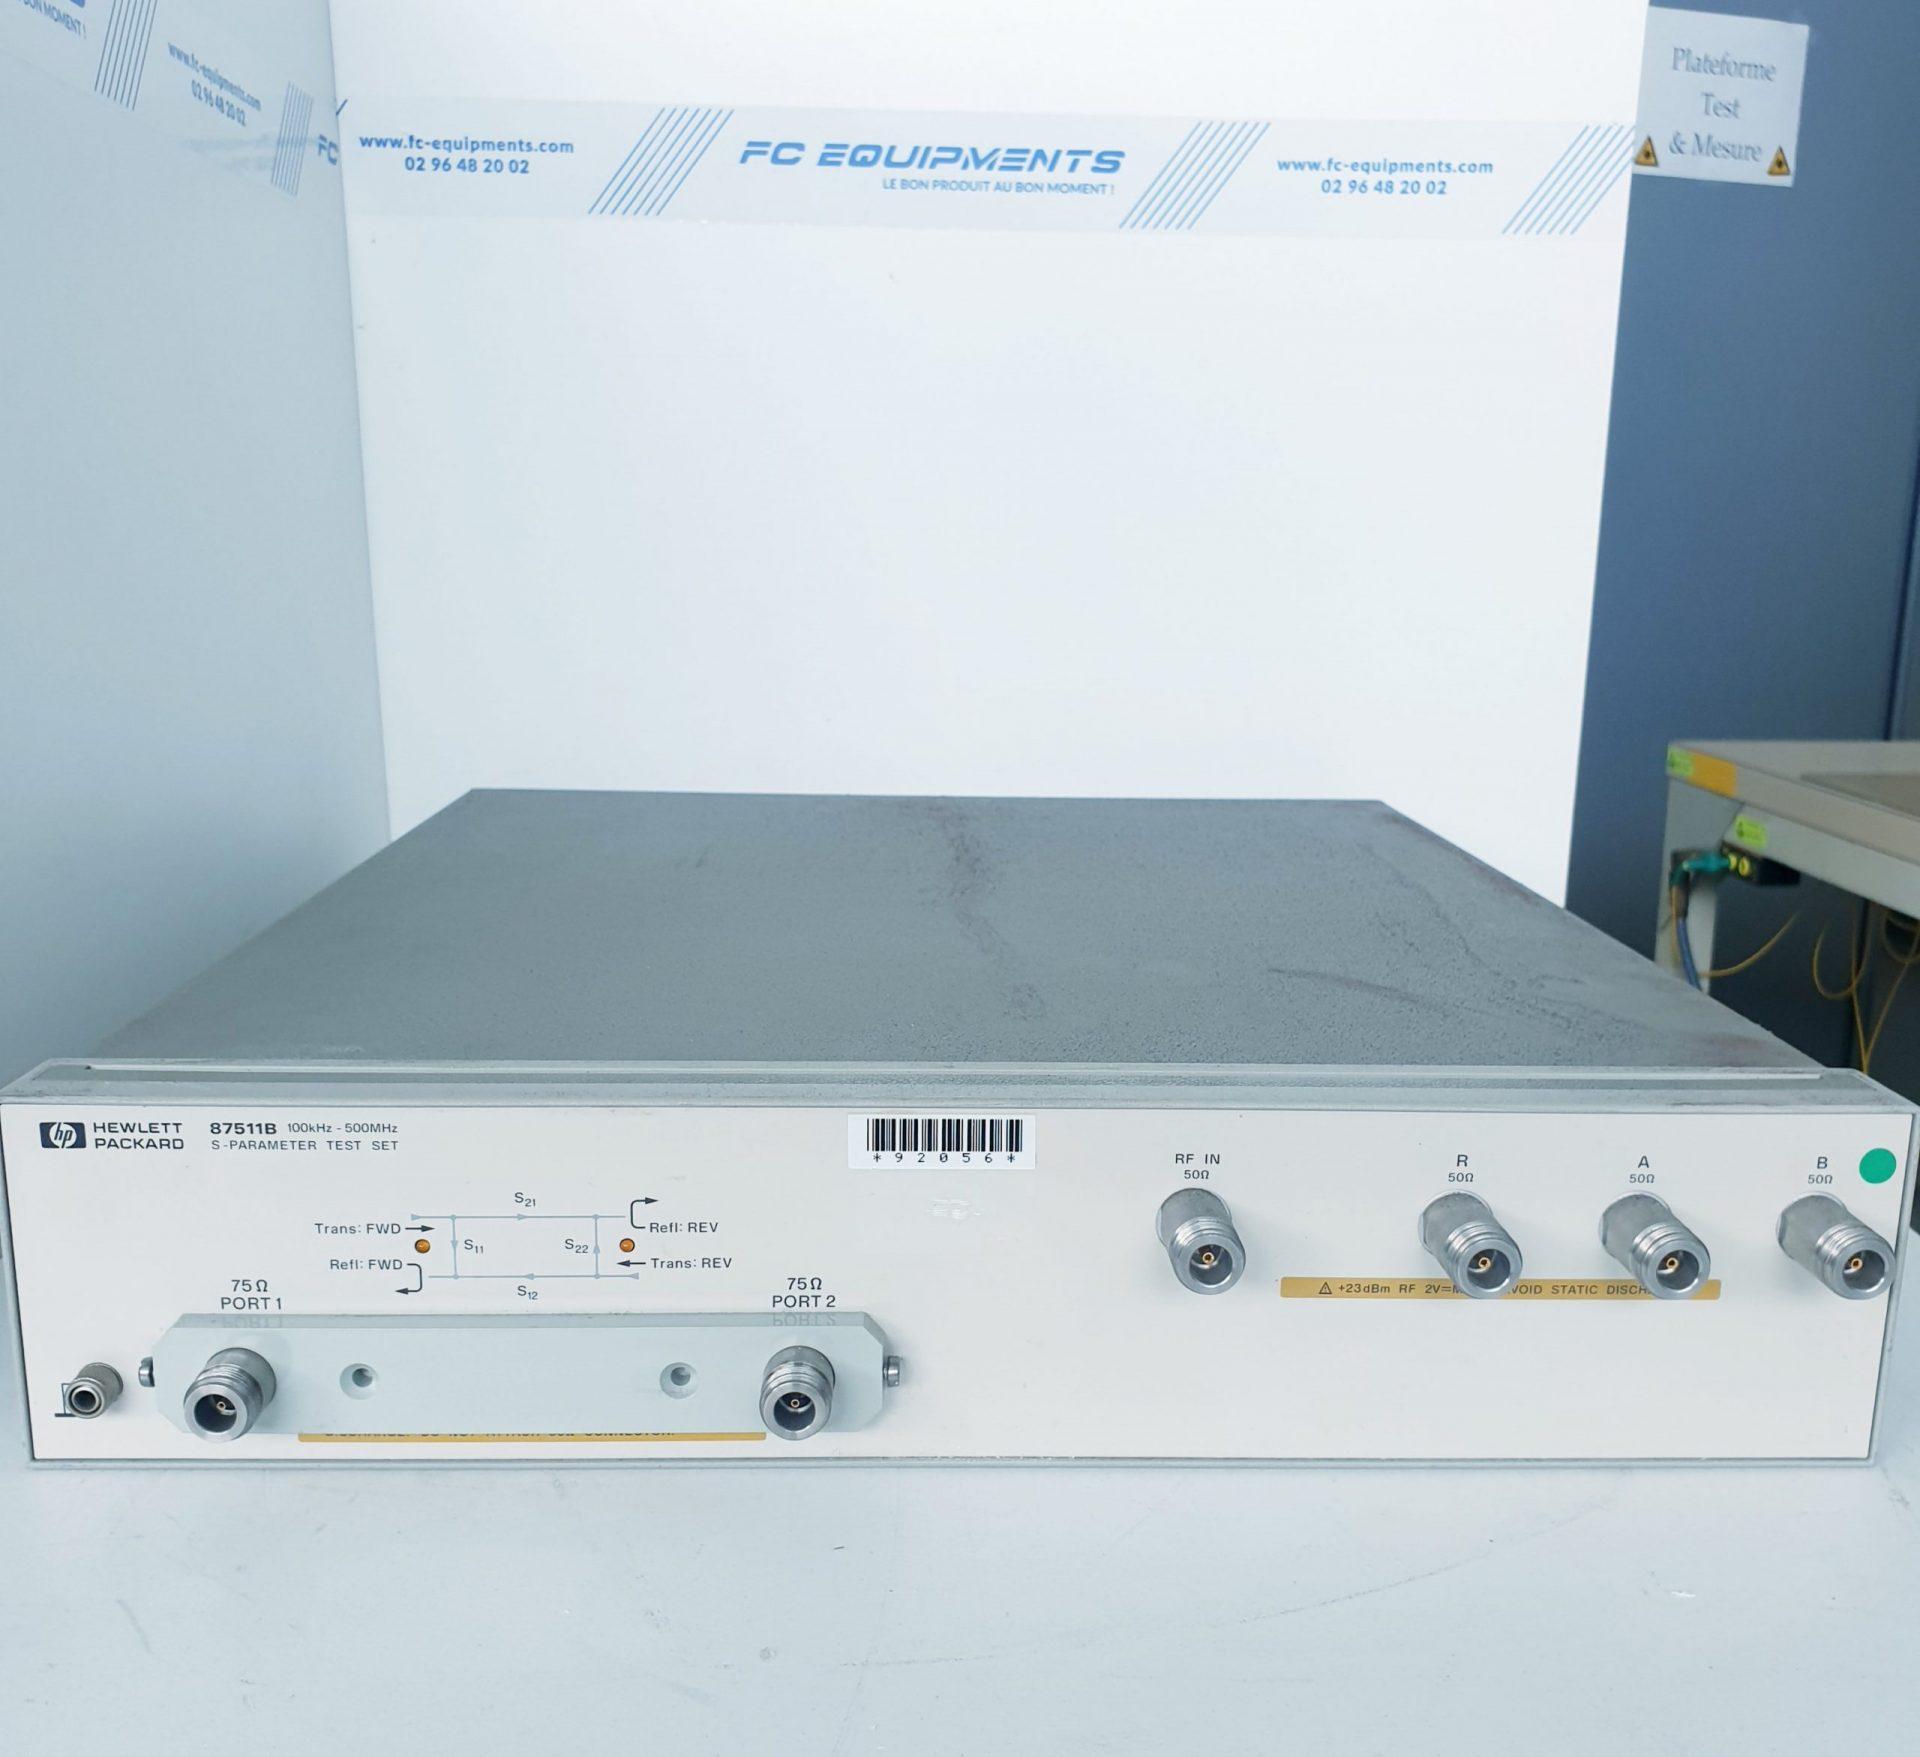 S-PARAMETER TEST SET 100KHz - 500MHz - KEYSIGHT TECHNOLOGIES (AGILENT/HP)